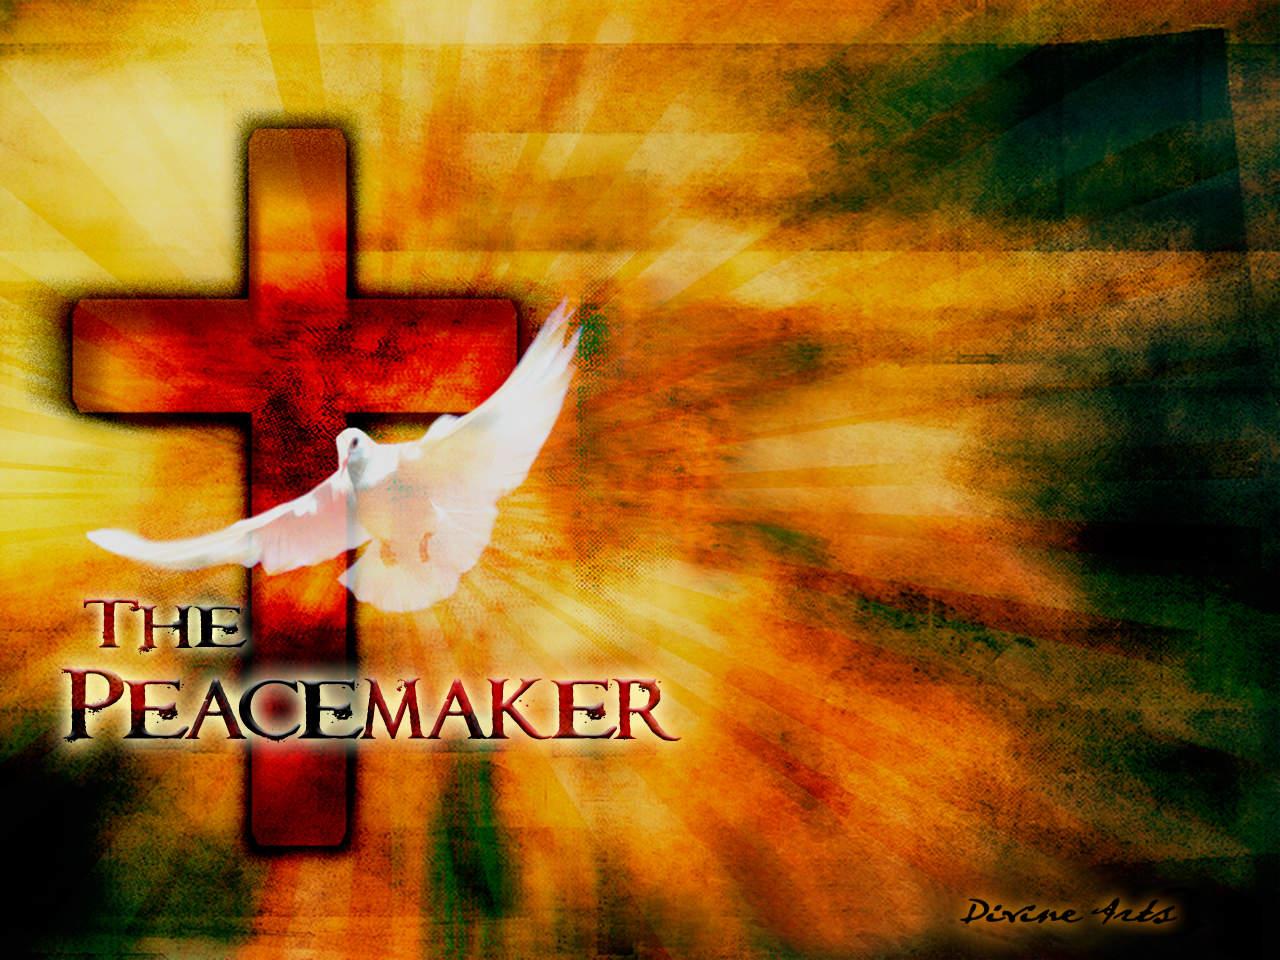 http://3.bp.blogspot.com/-phOw_2vRos4/T3E4mRa7gII/AAAAAAAAAIc/jzEbgh9WPiQ/s1600/holy-spirit_298_1280x960.jpg